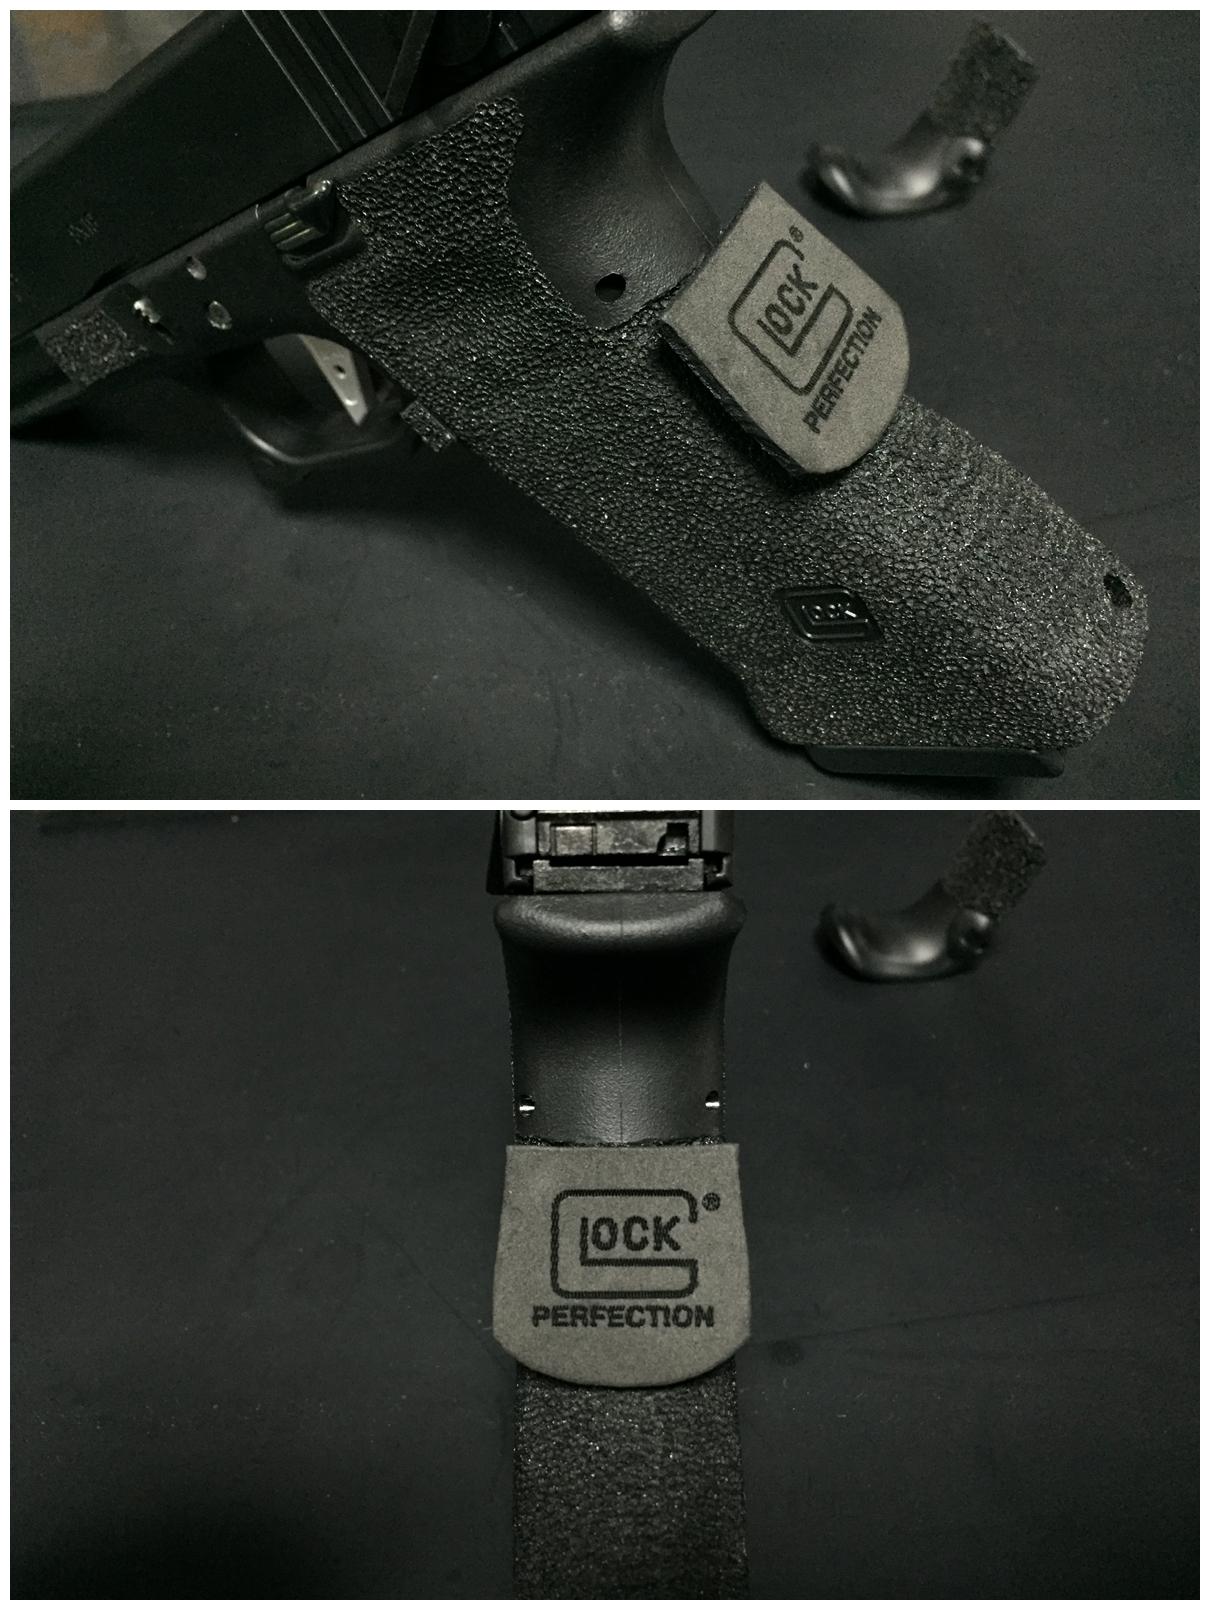 4 GLOCK グロックG UARDER 実銃素材 ビーバーテール 専用 DIY 自作 刻印入り クッション パット 作製 取付 加工 カスタム